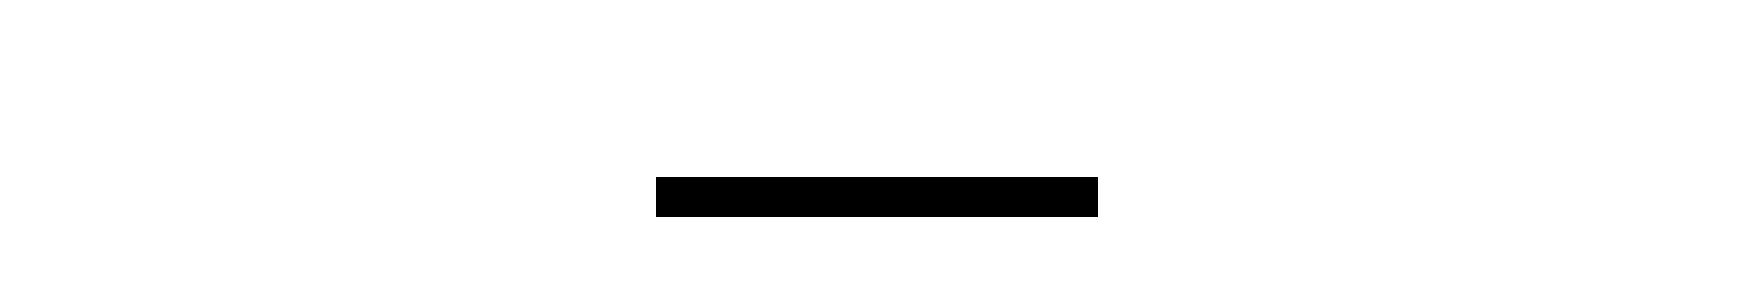 BonnuitPictogrammes